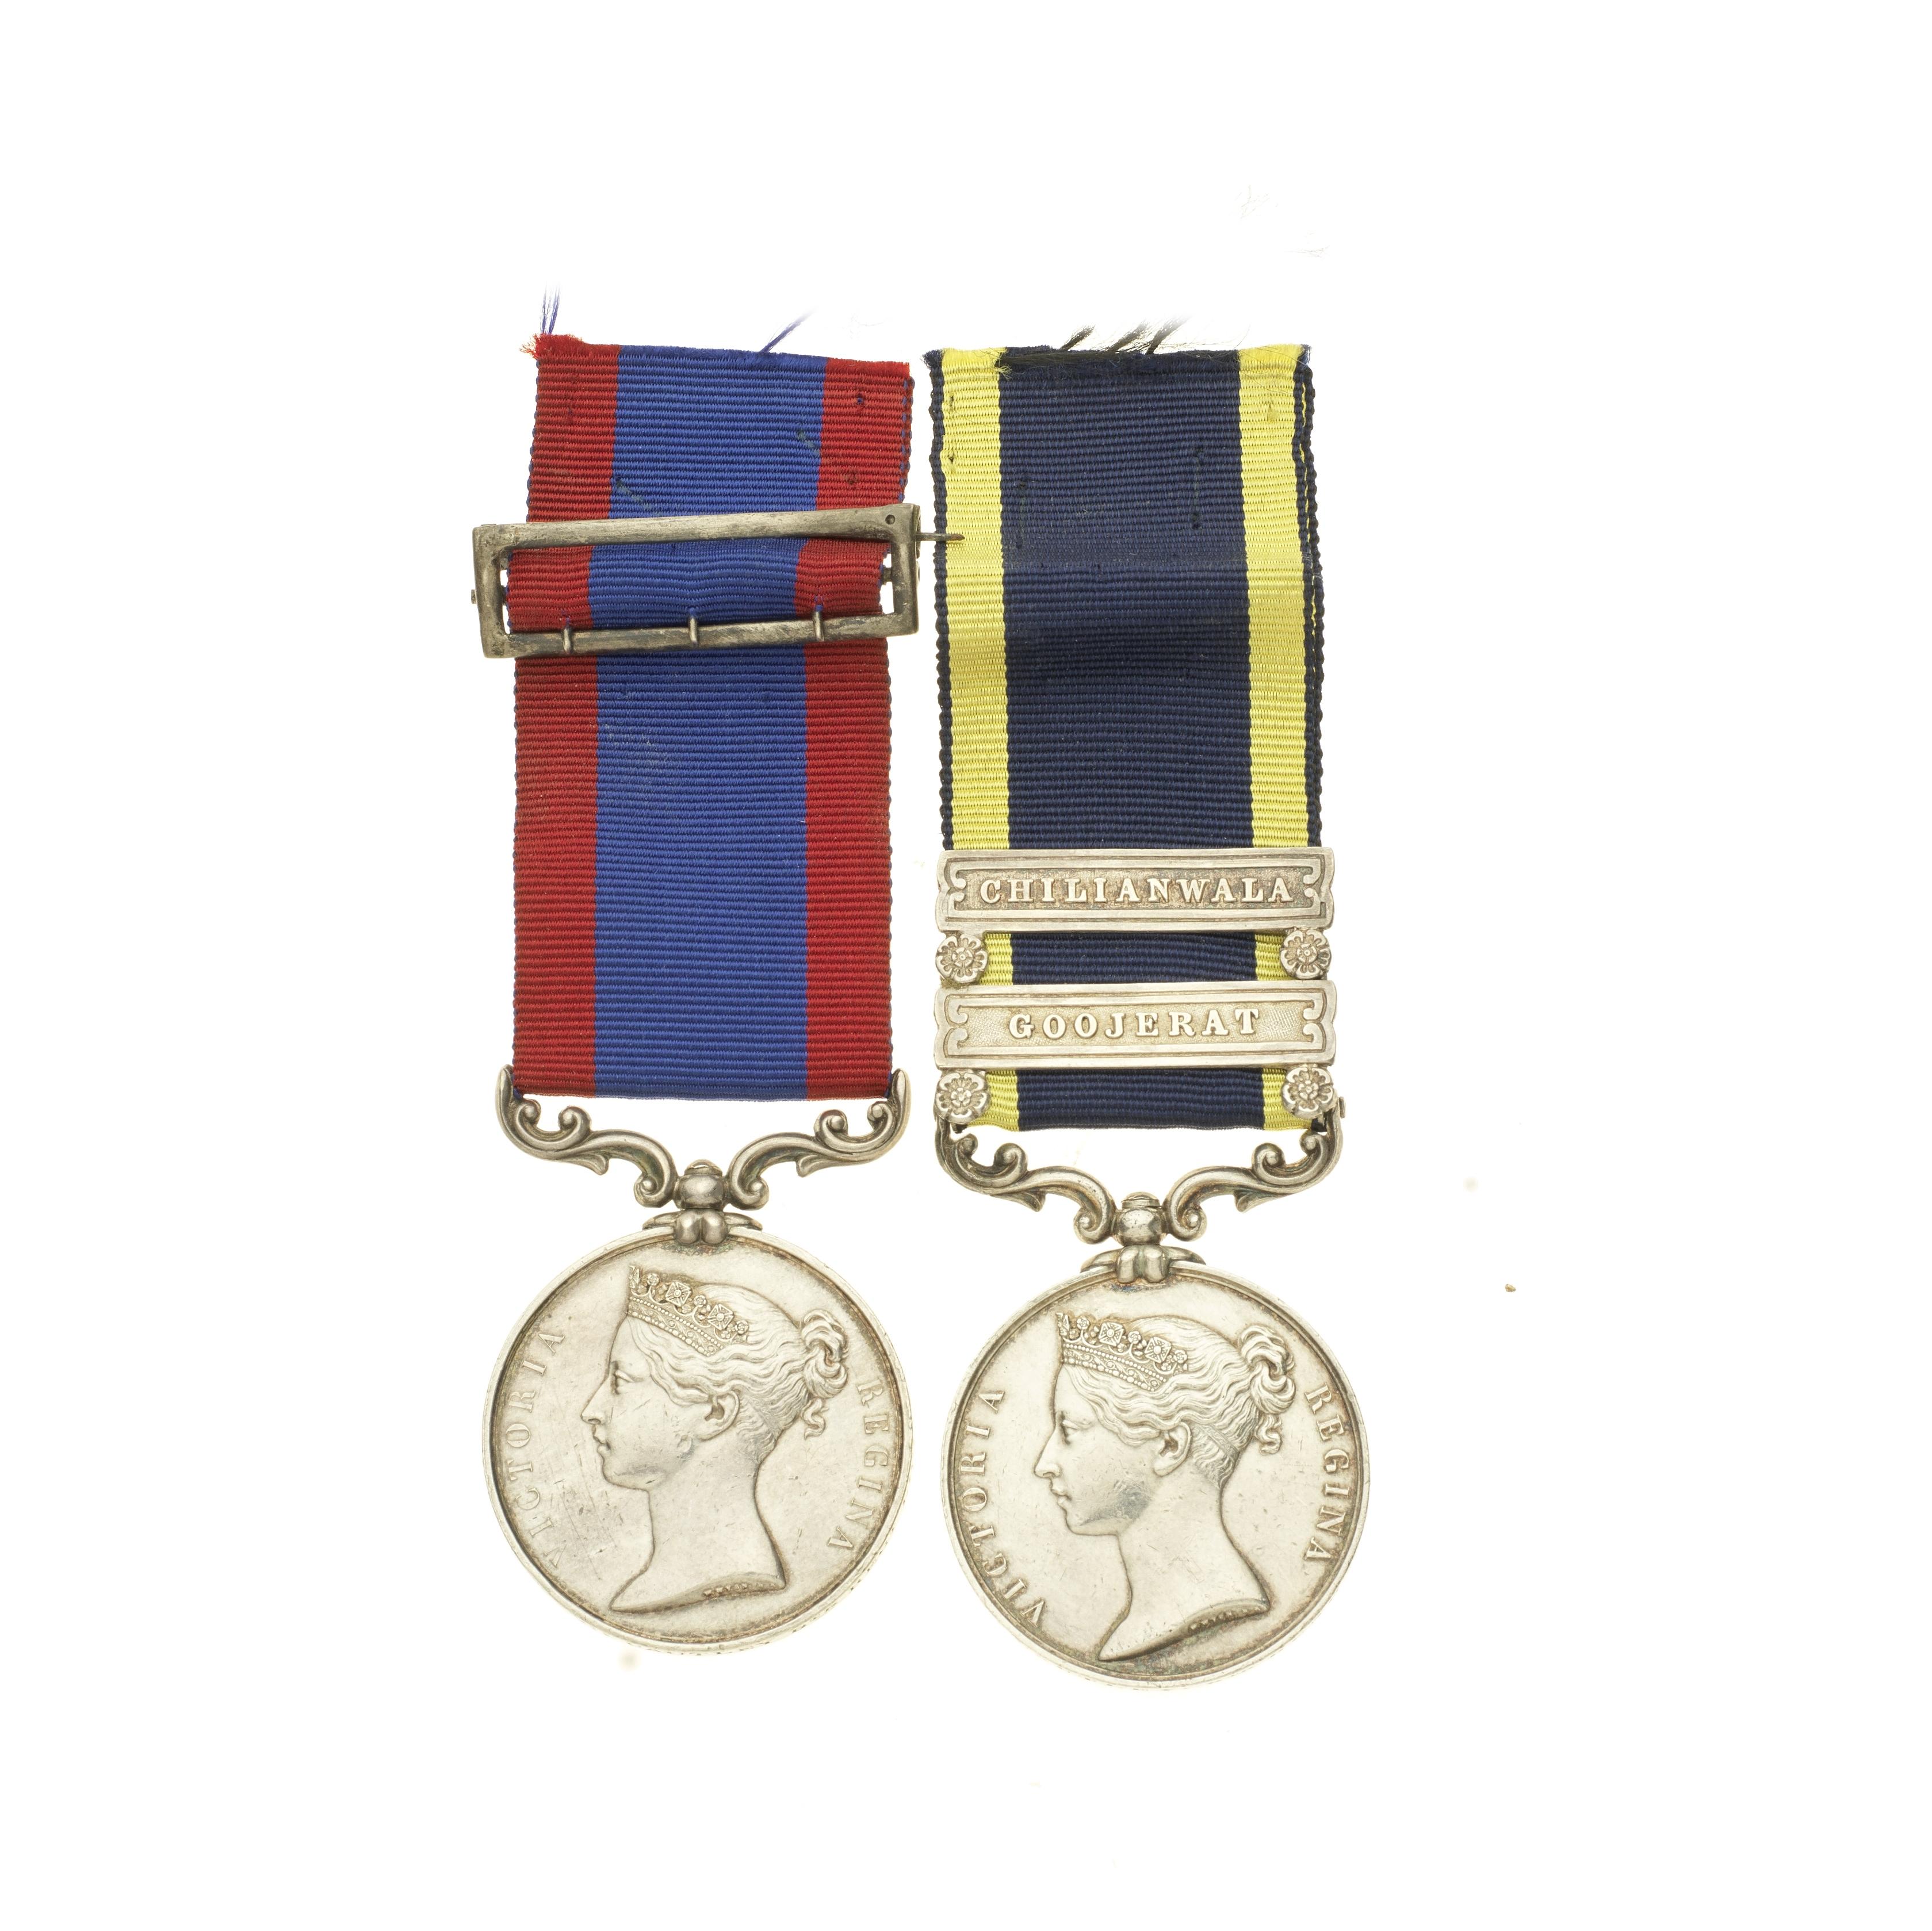 Pair to Major General G.Cautley, 5th European Light Cavalry, 8th Bengal Cavalry,